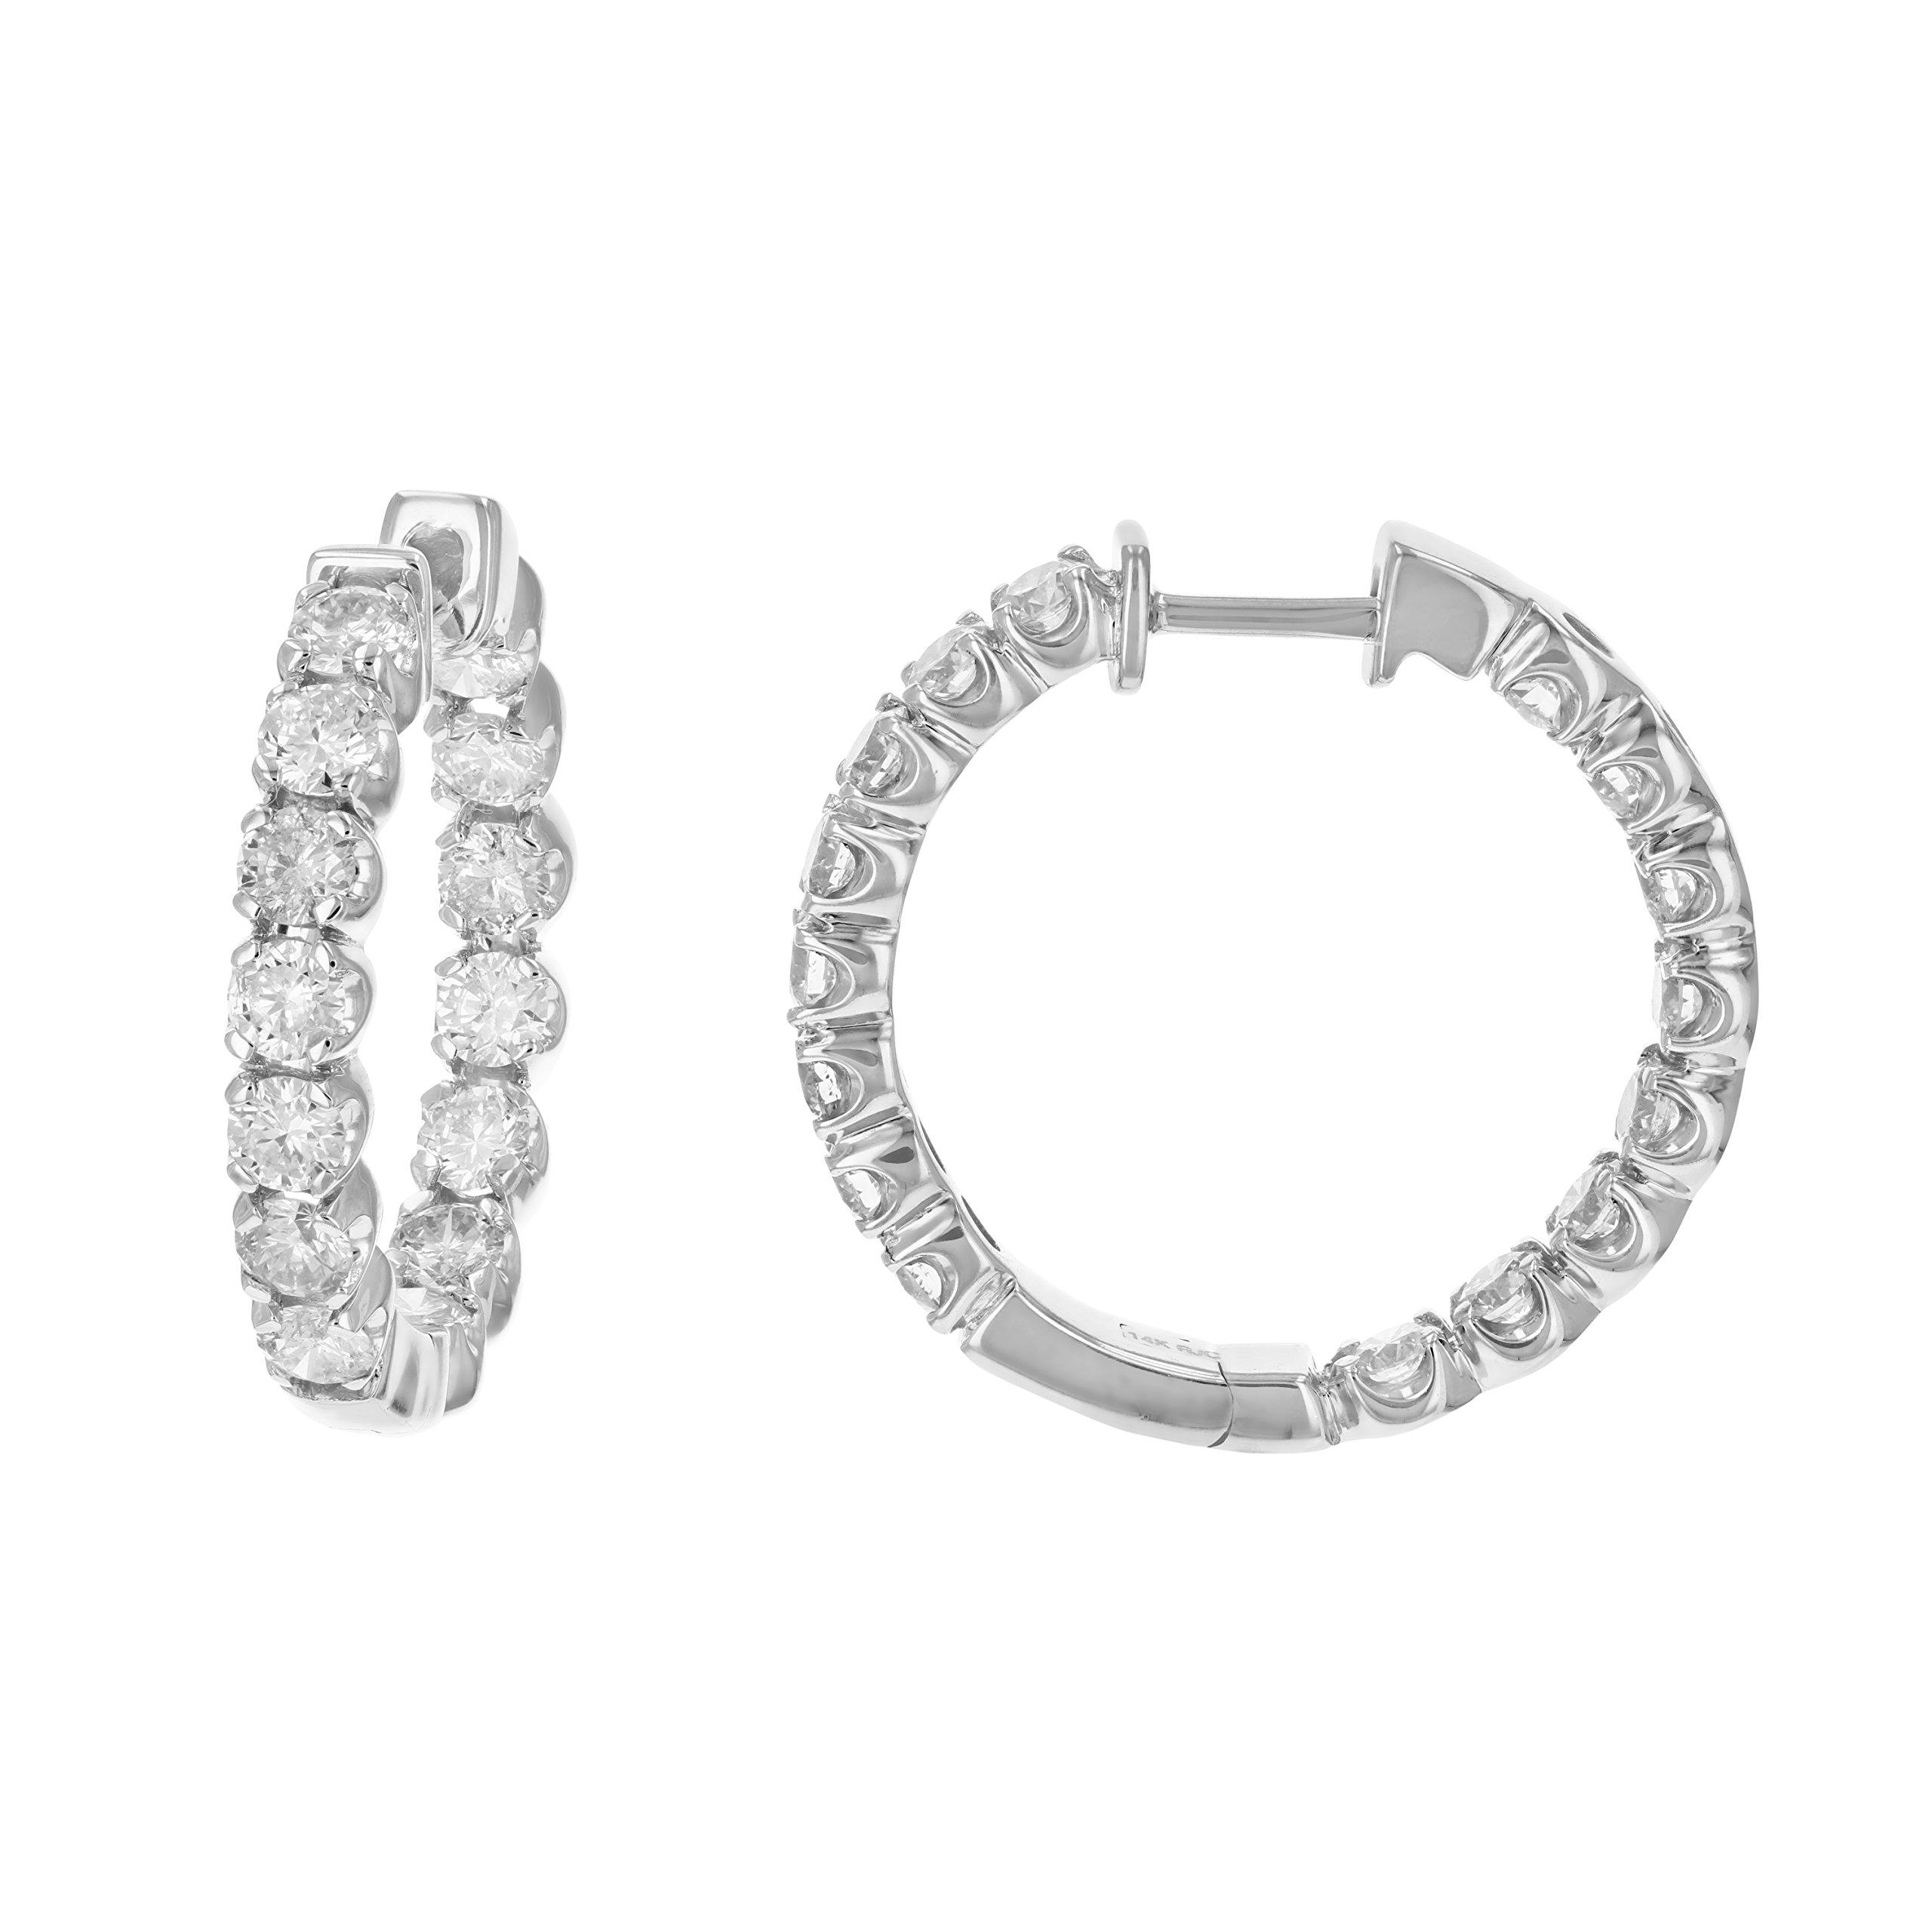 4 cttw SI2-I1 Certified 14K White Gold Diamond Inside Out Hoop Earrings (J-K) by Vir Jewels (Image #1)